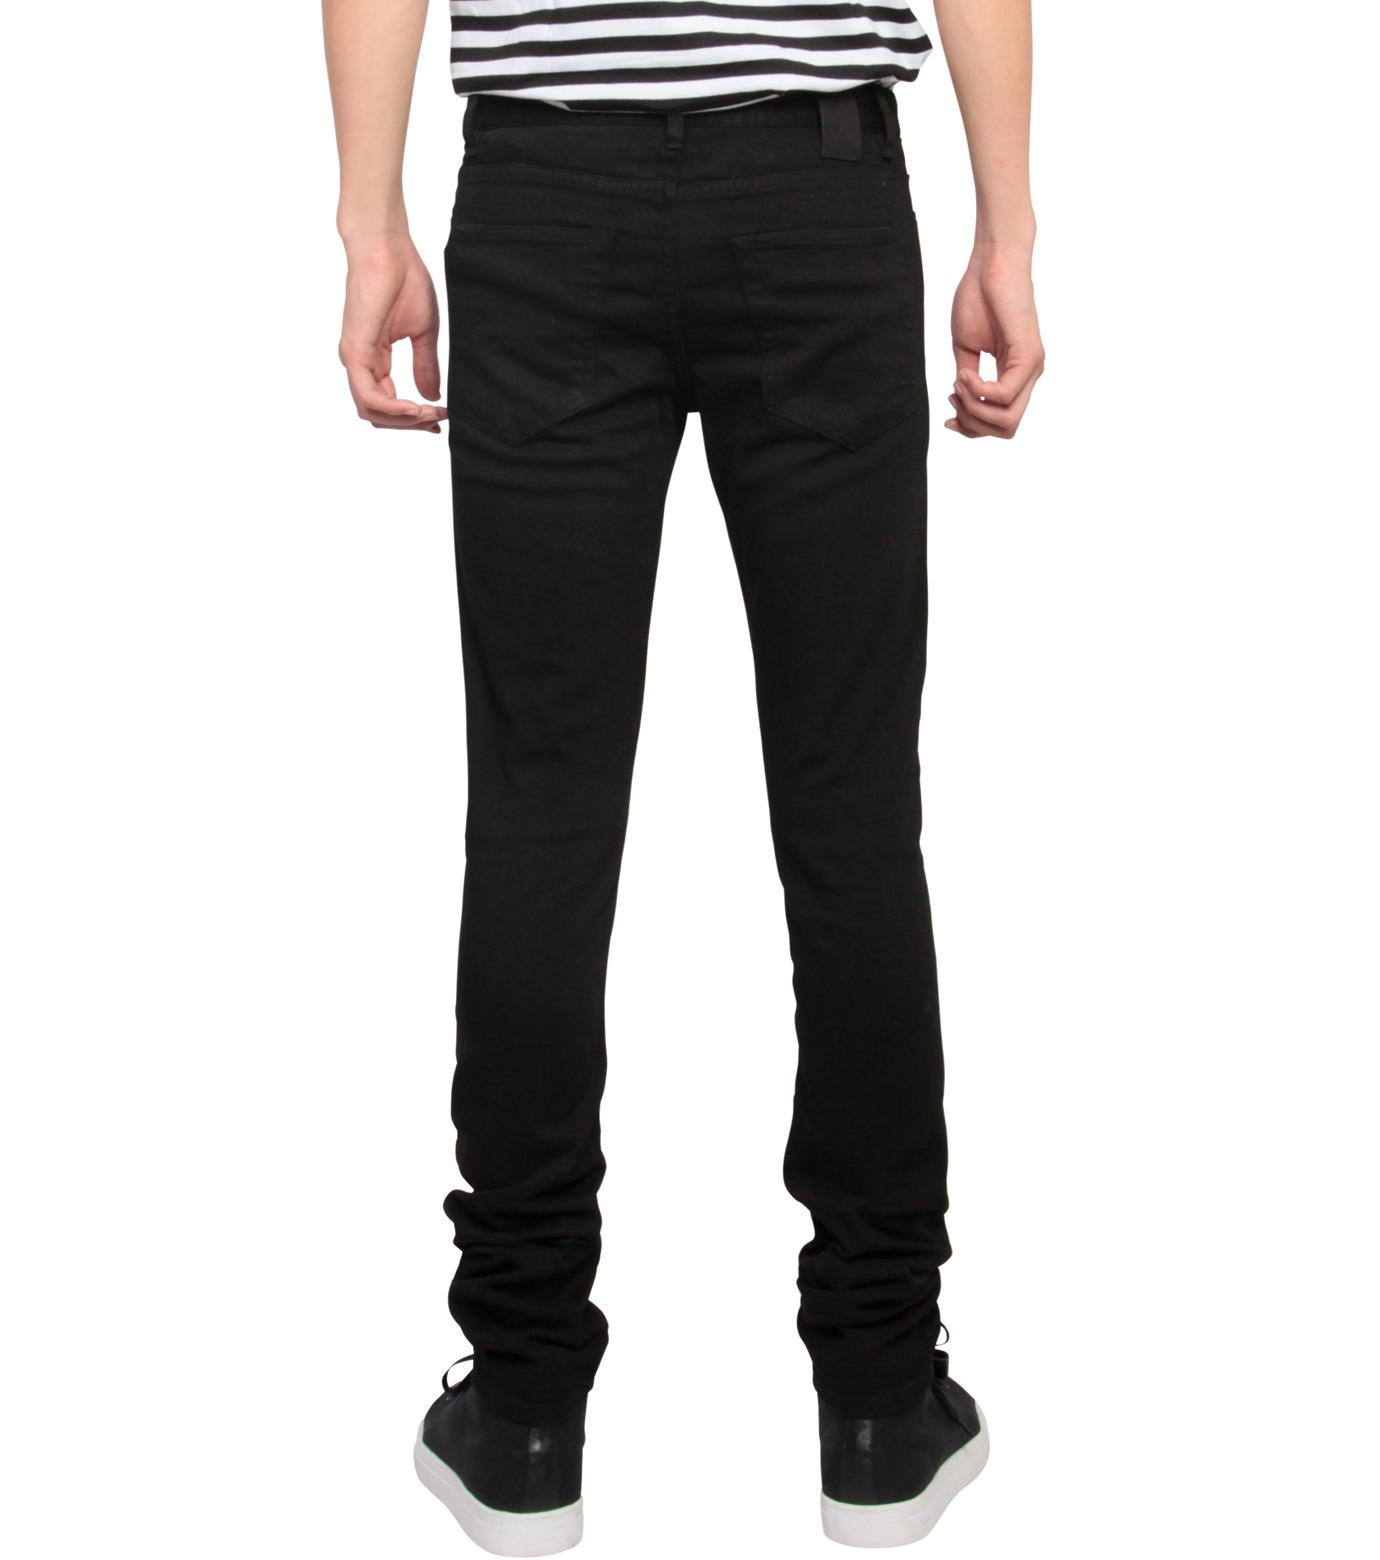 HL HEDDIE LOVU(エイチエル・エディールーヴ)のHL skinslim-BLACK(パンツ/pants)-HL-skinslim-13 拡大詳細画像2